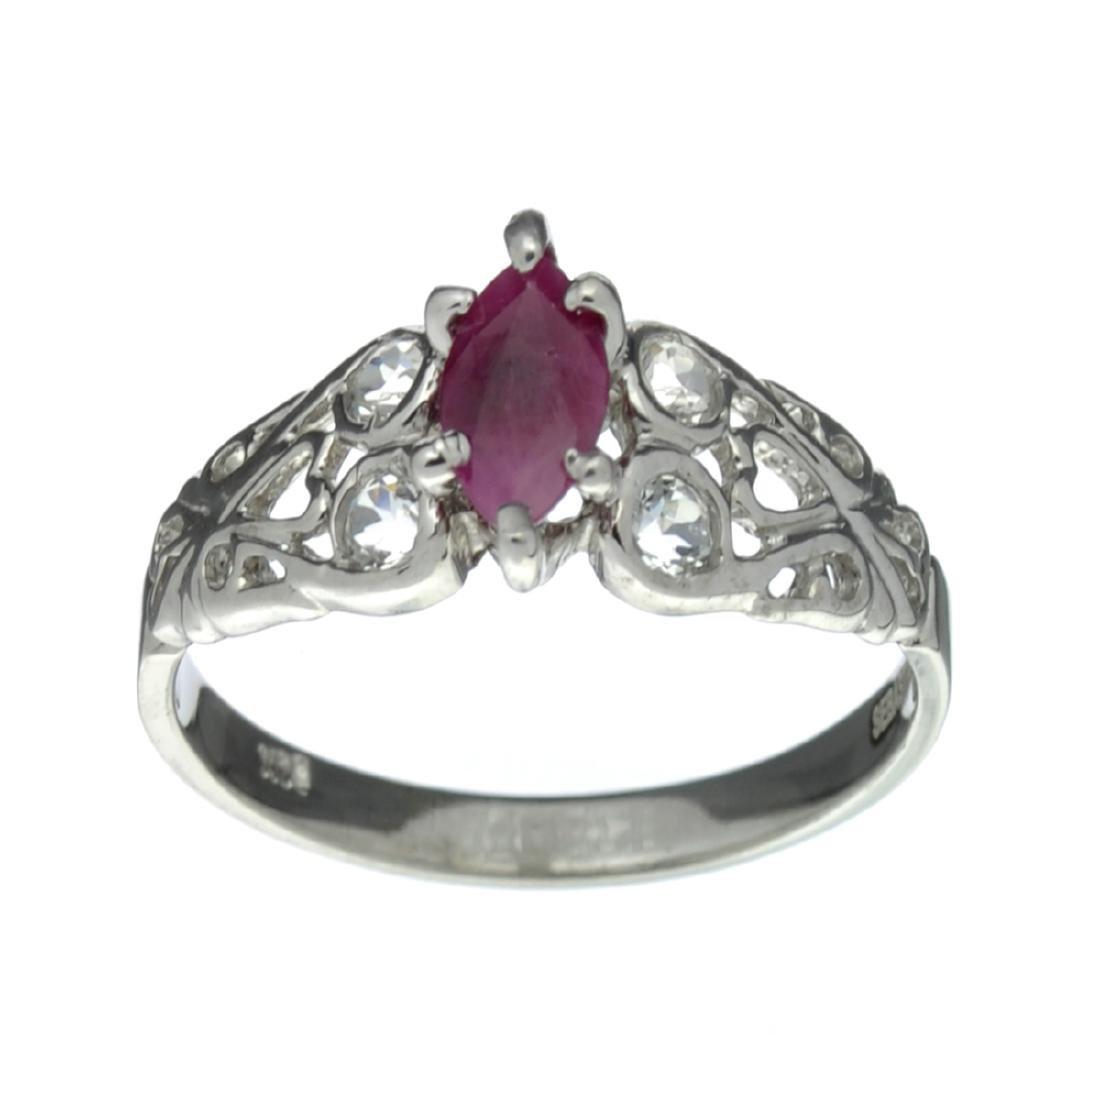 APP: 0.5k Fine Jewelry Designer Sebastian, 0.91CT Ruby